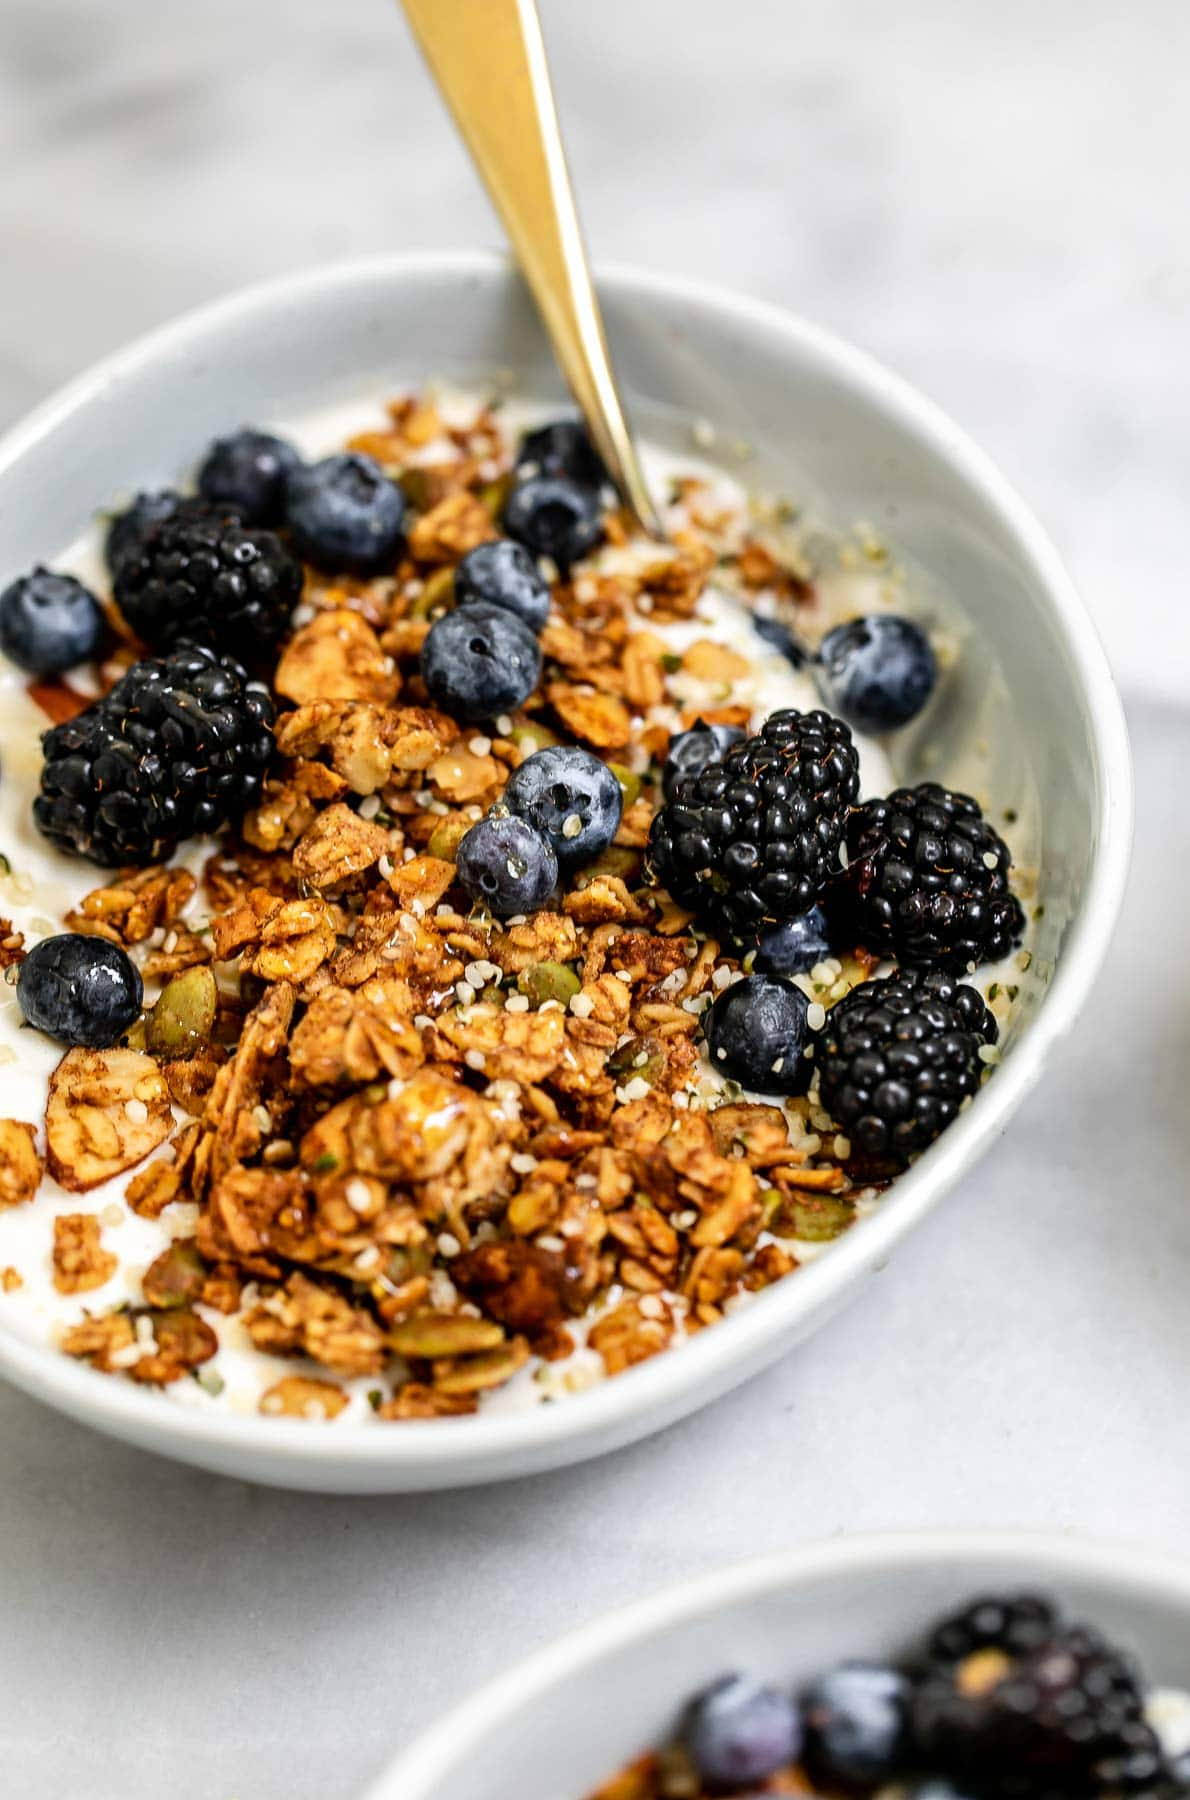 Gluten free granola on top of yogurt with berries.